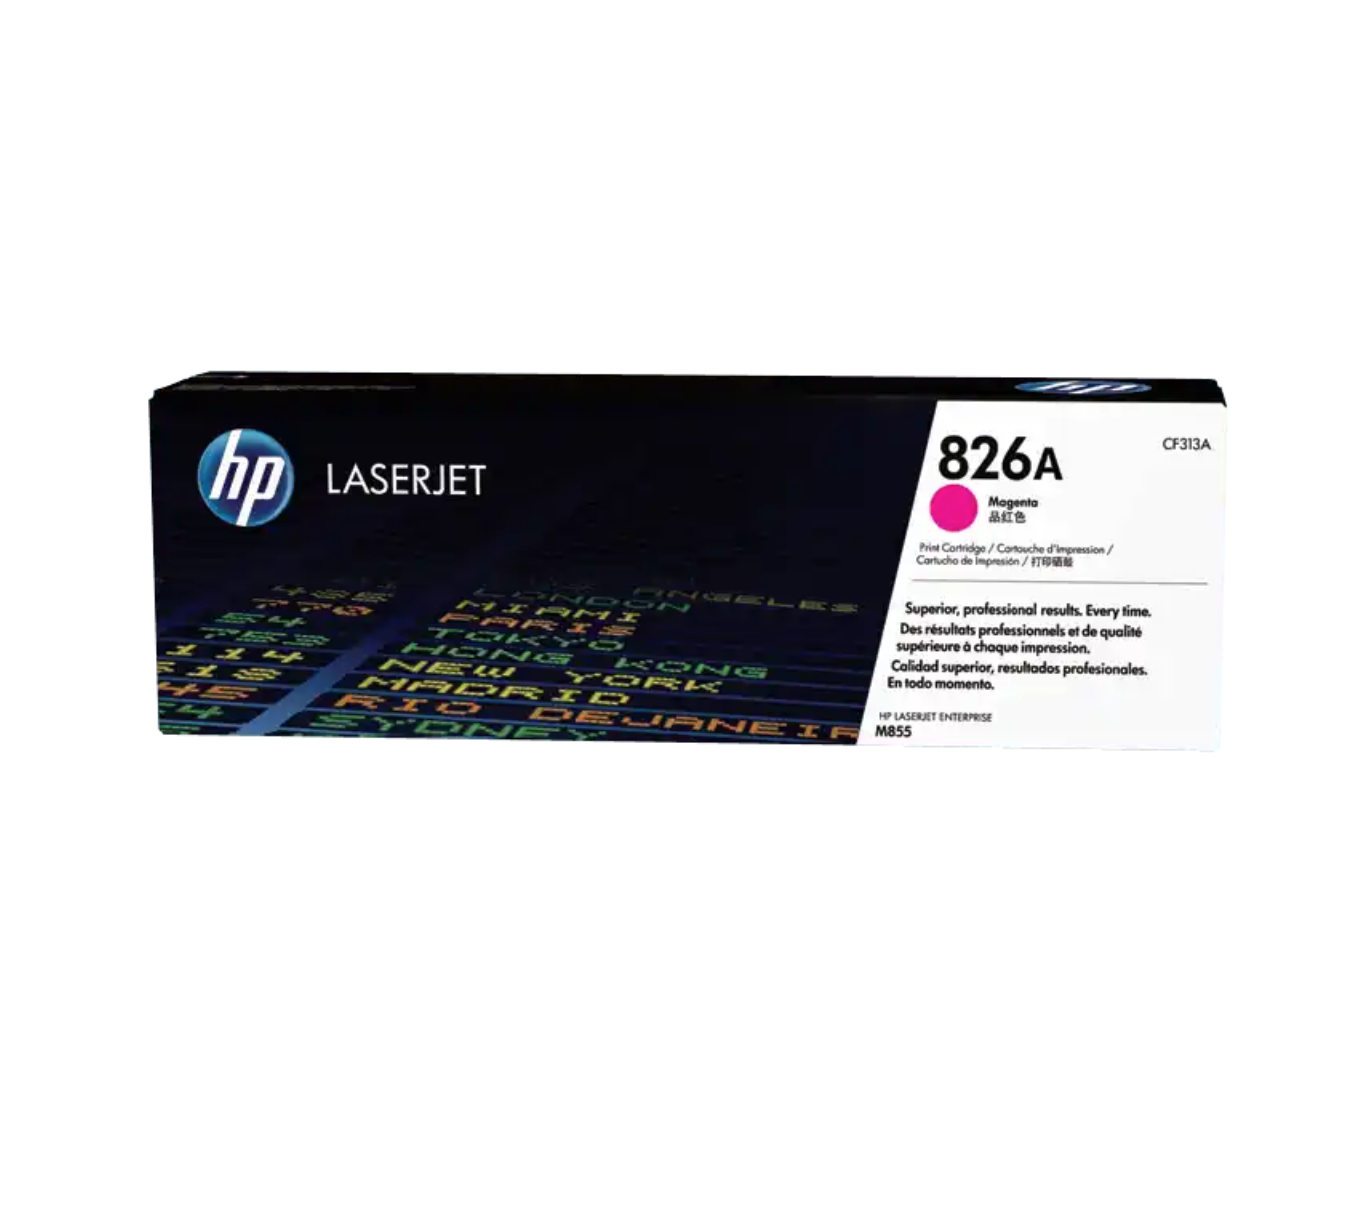 HP 826A 洋紅原廠 LaserJet 碳粉 CF313A